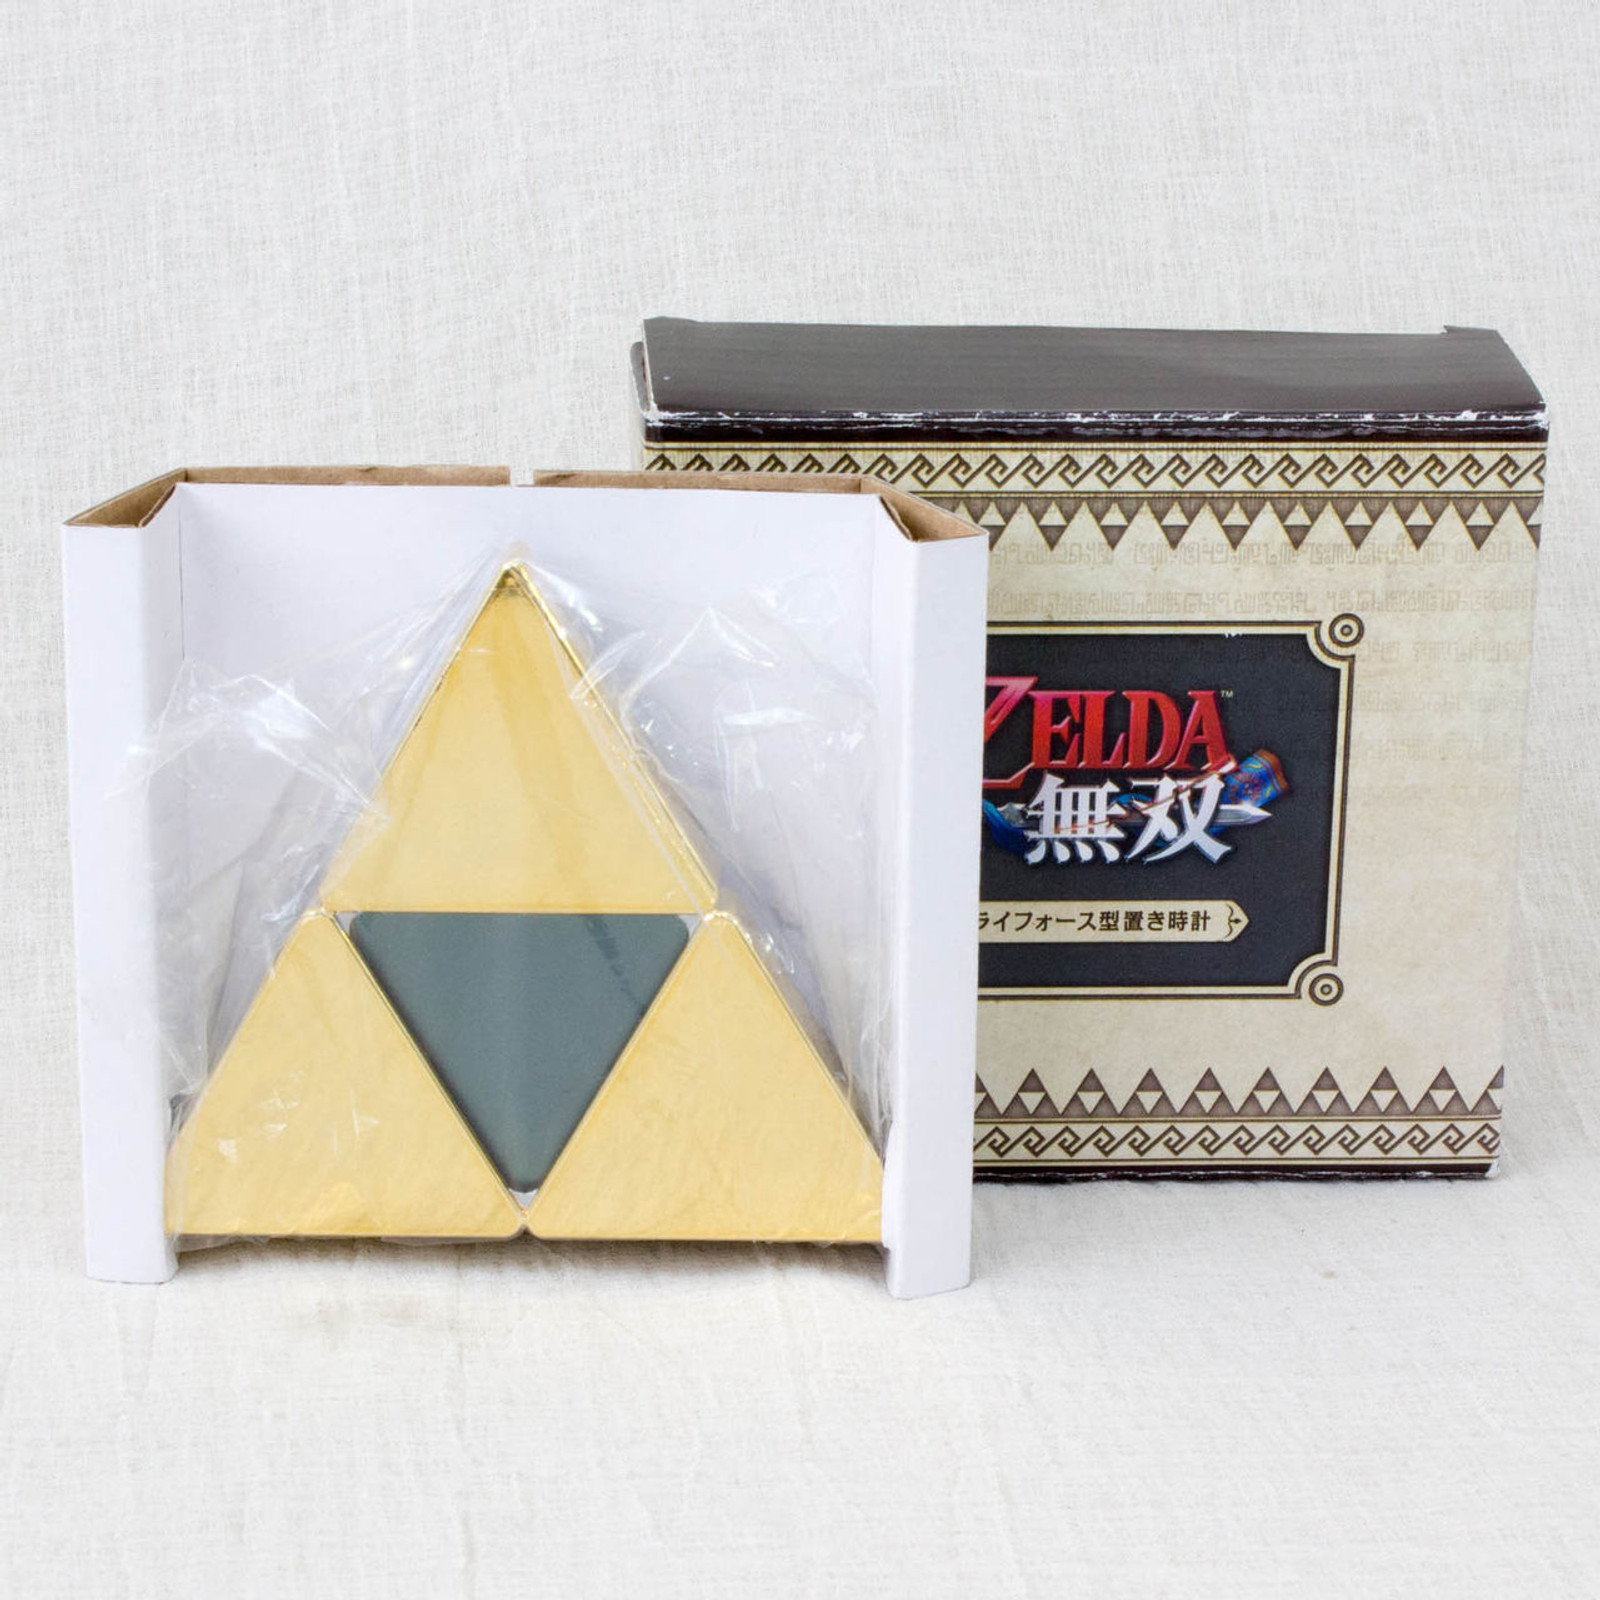 RARE! Zelda Muso Hyrule Warriors Tri-Force Type Alarm Clock JAPAN KOEI NINTENDO